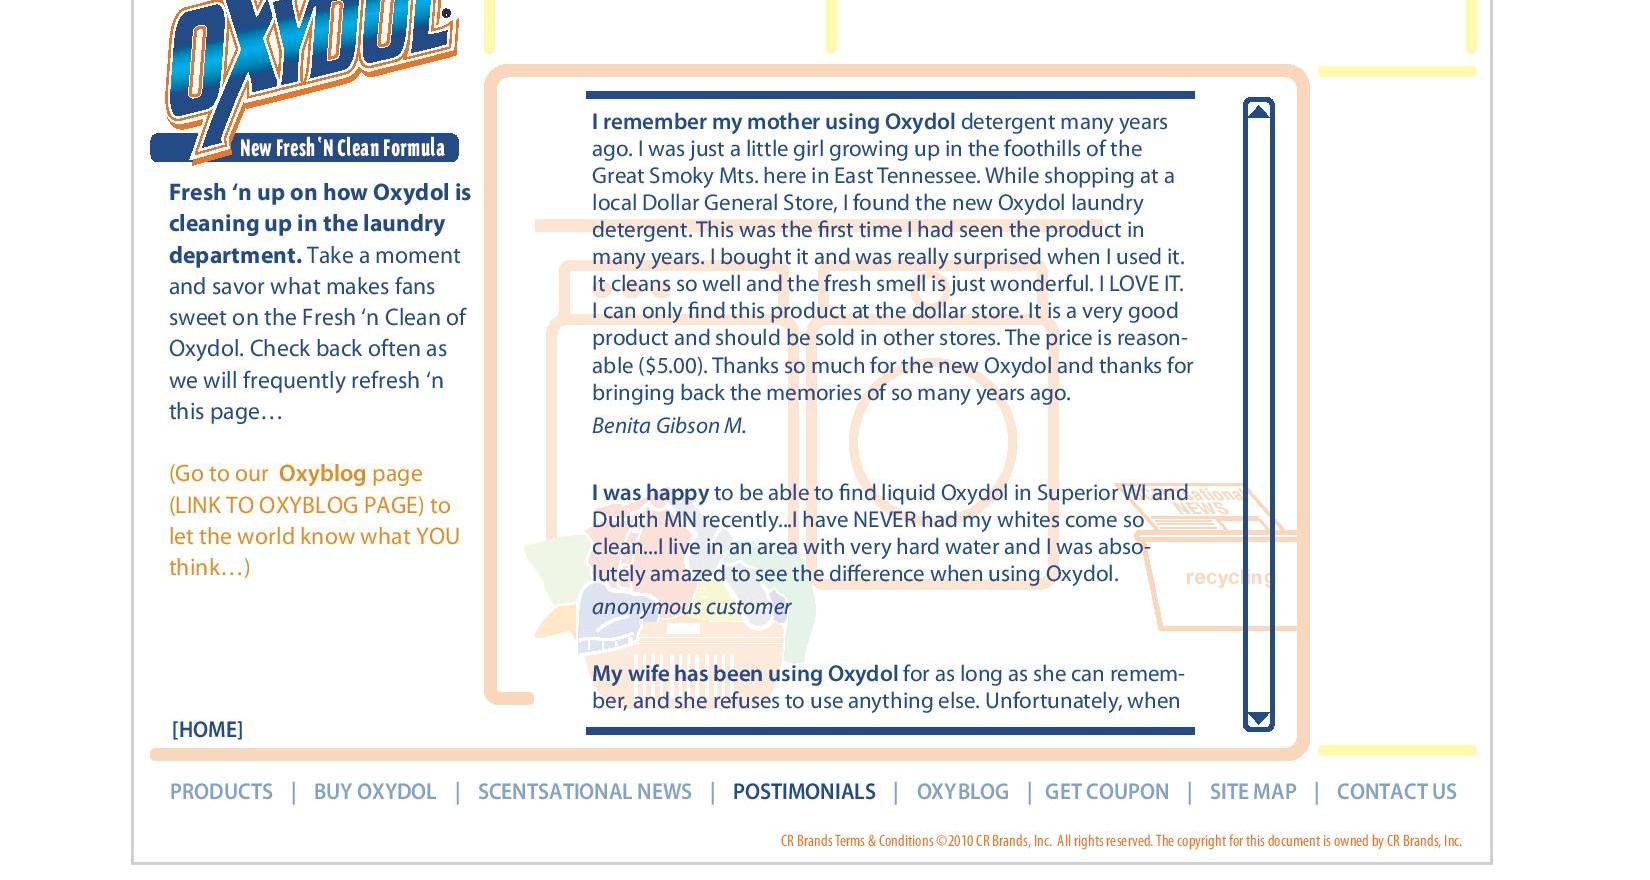 Oxydol_web-page-005.jpg